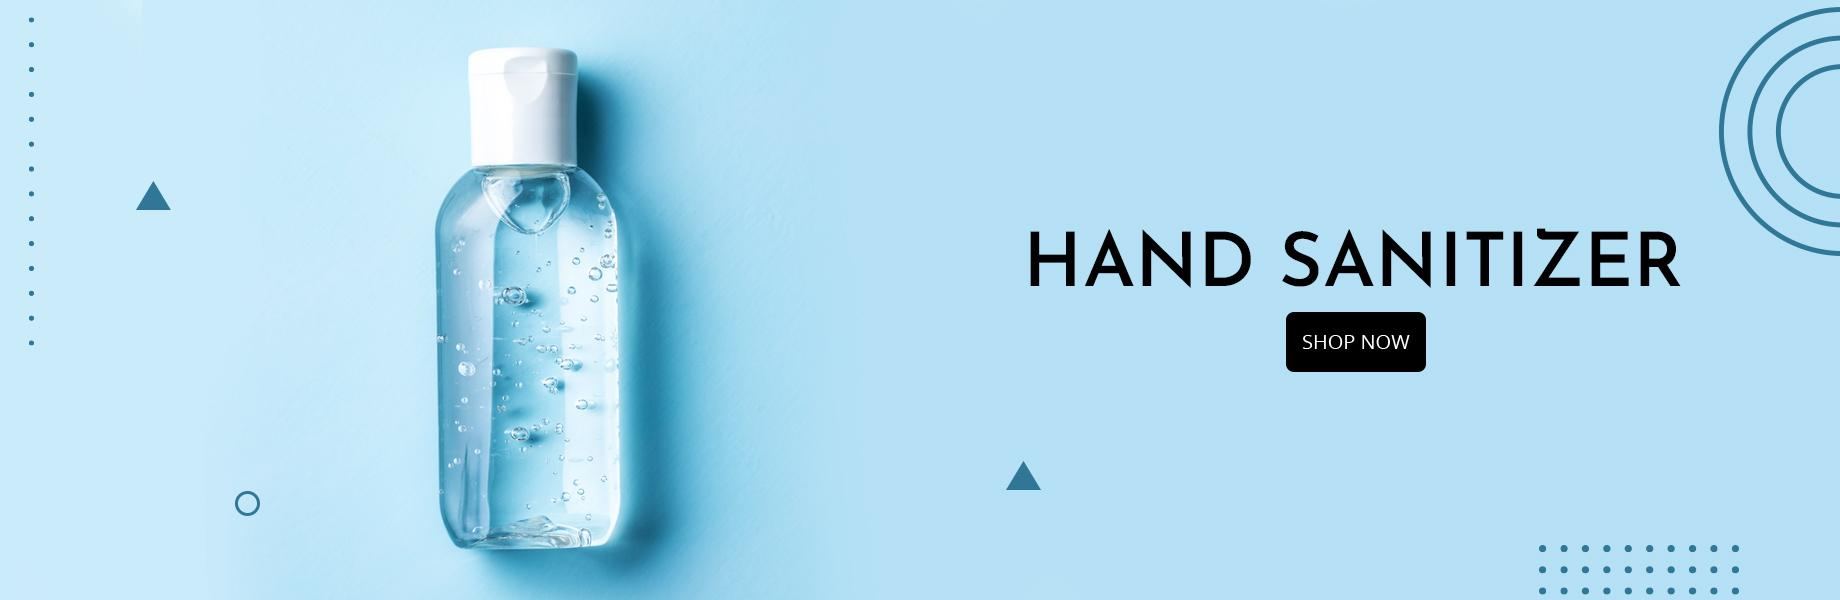 Womens-Page-EveryDay-Essentials-Static-Hand-Sanitizer-Web.jpg